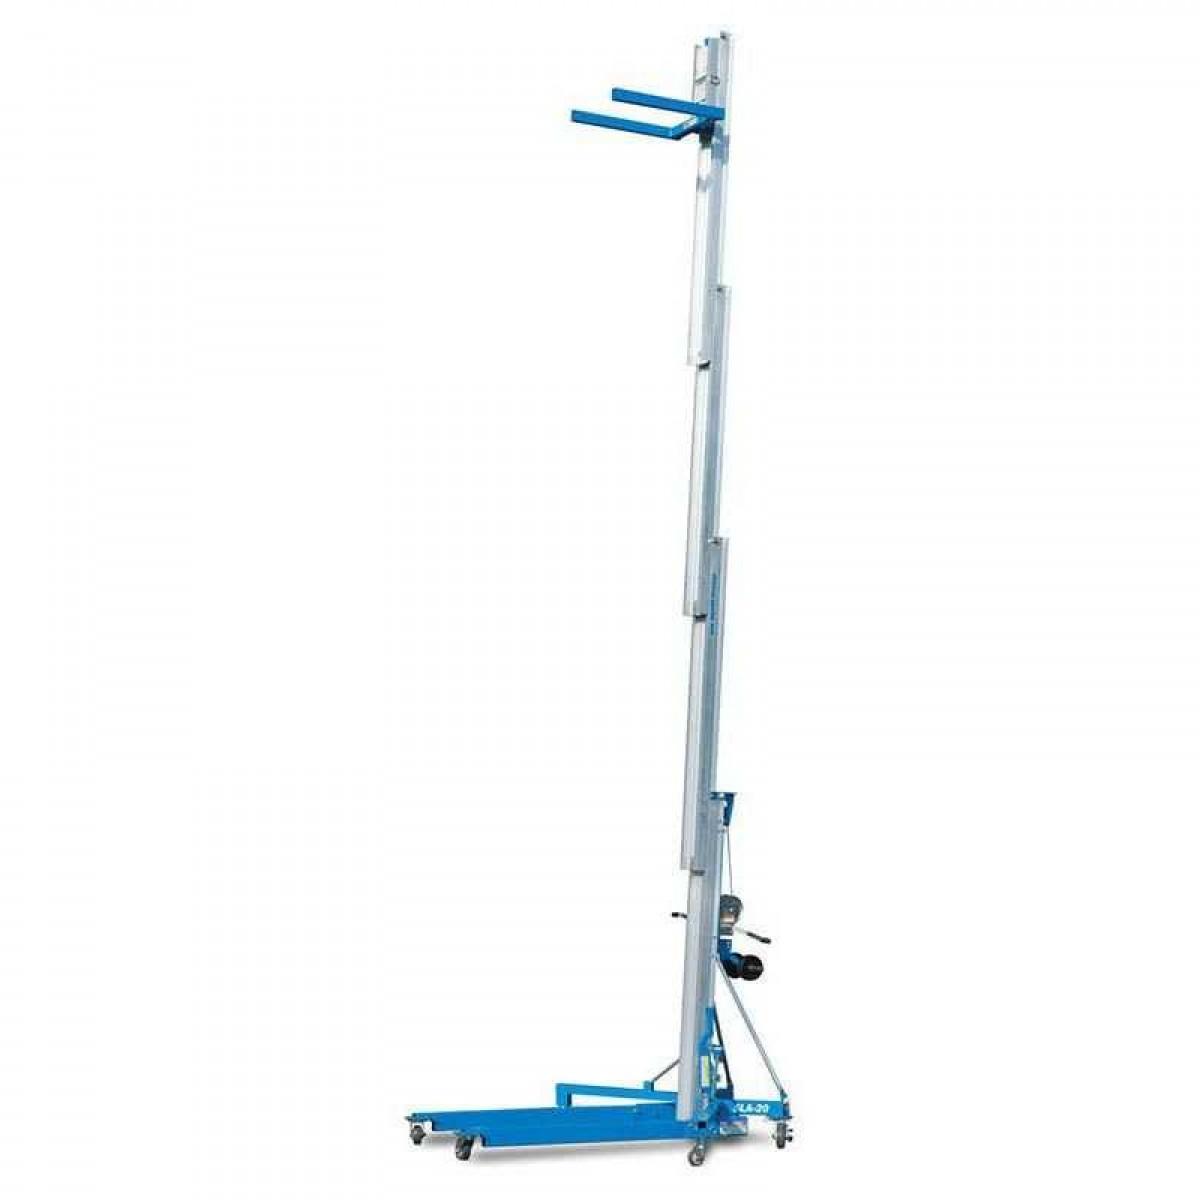 Genie SLA-25 Superlift Advantage Material Lift w